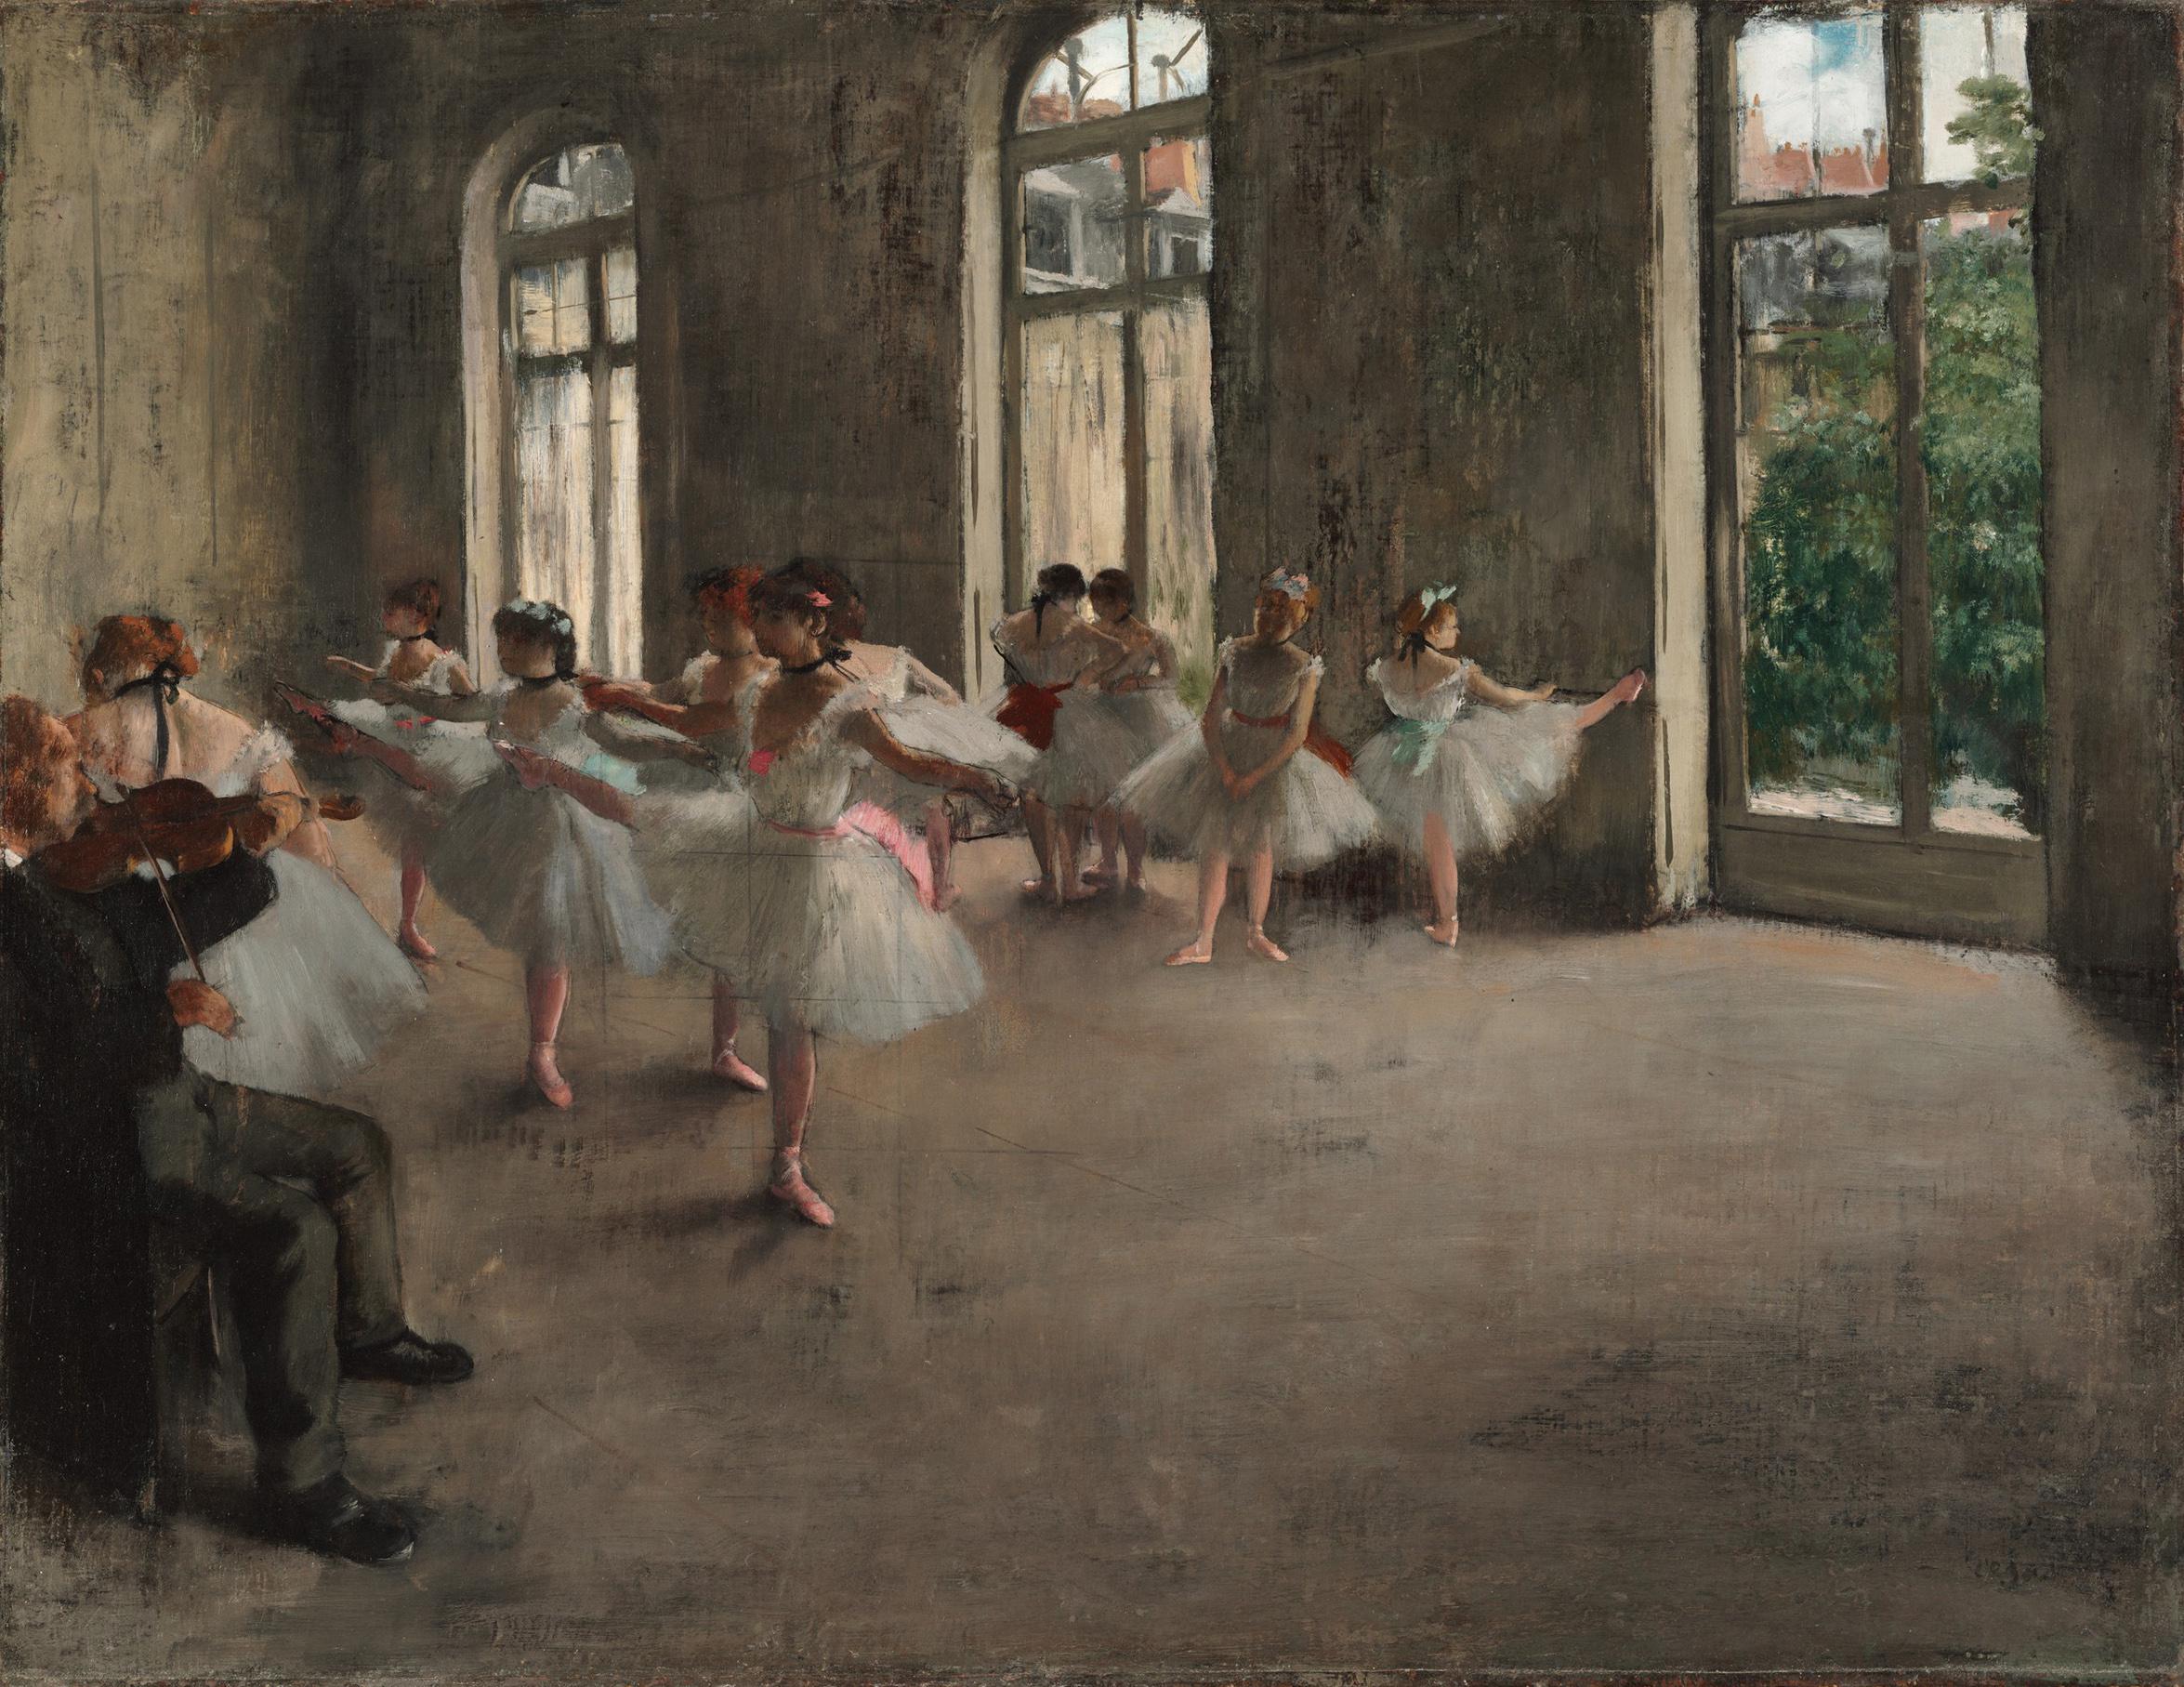 Edgar_Germain_Hilaire_Degas_004.jpg